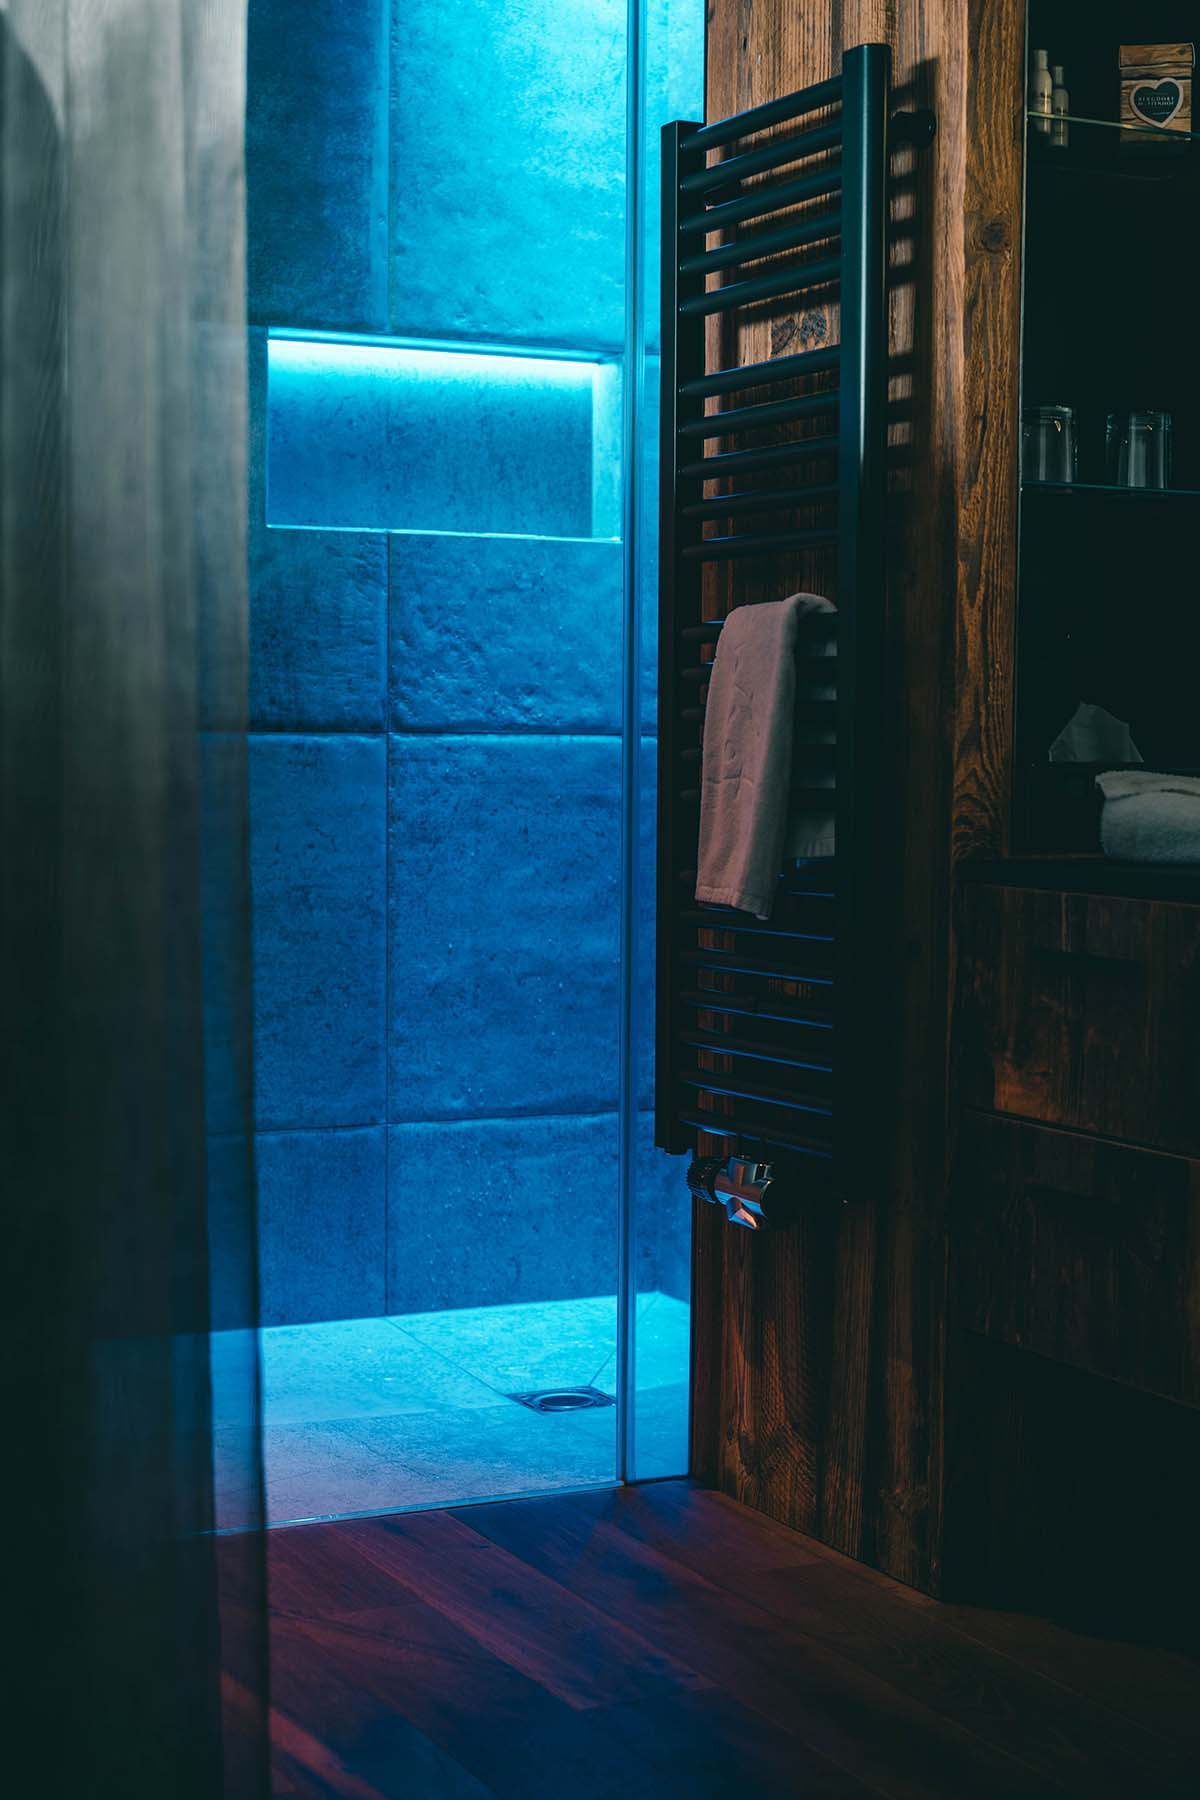 wellnesshotel-huettenhof-heizkoerper-dusche